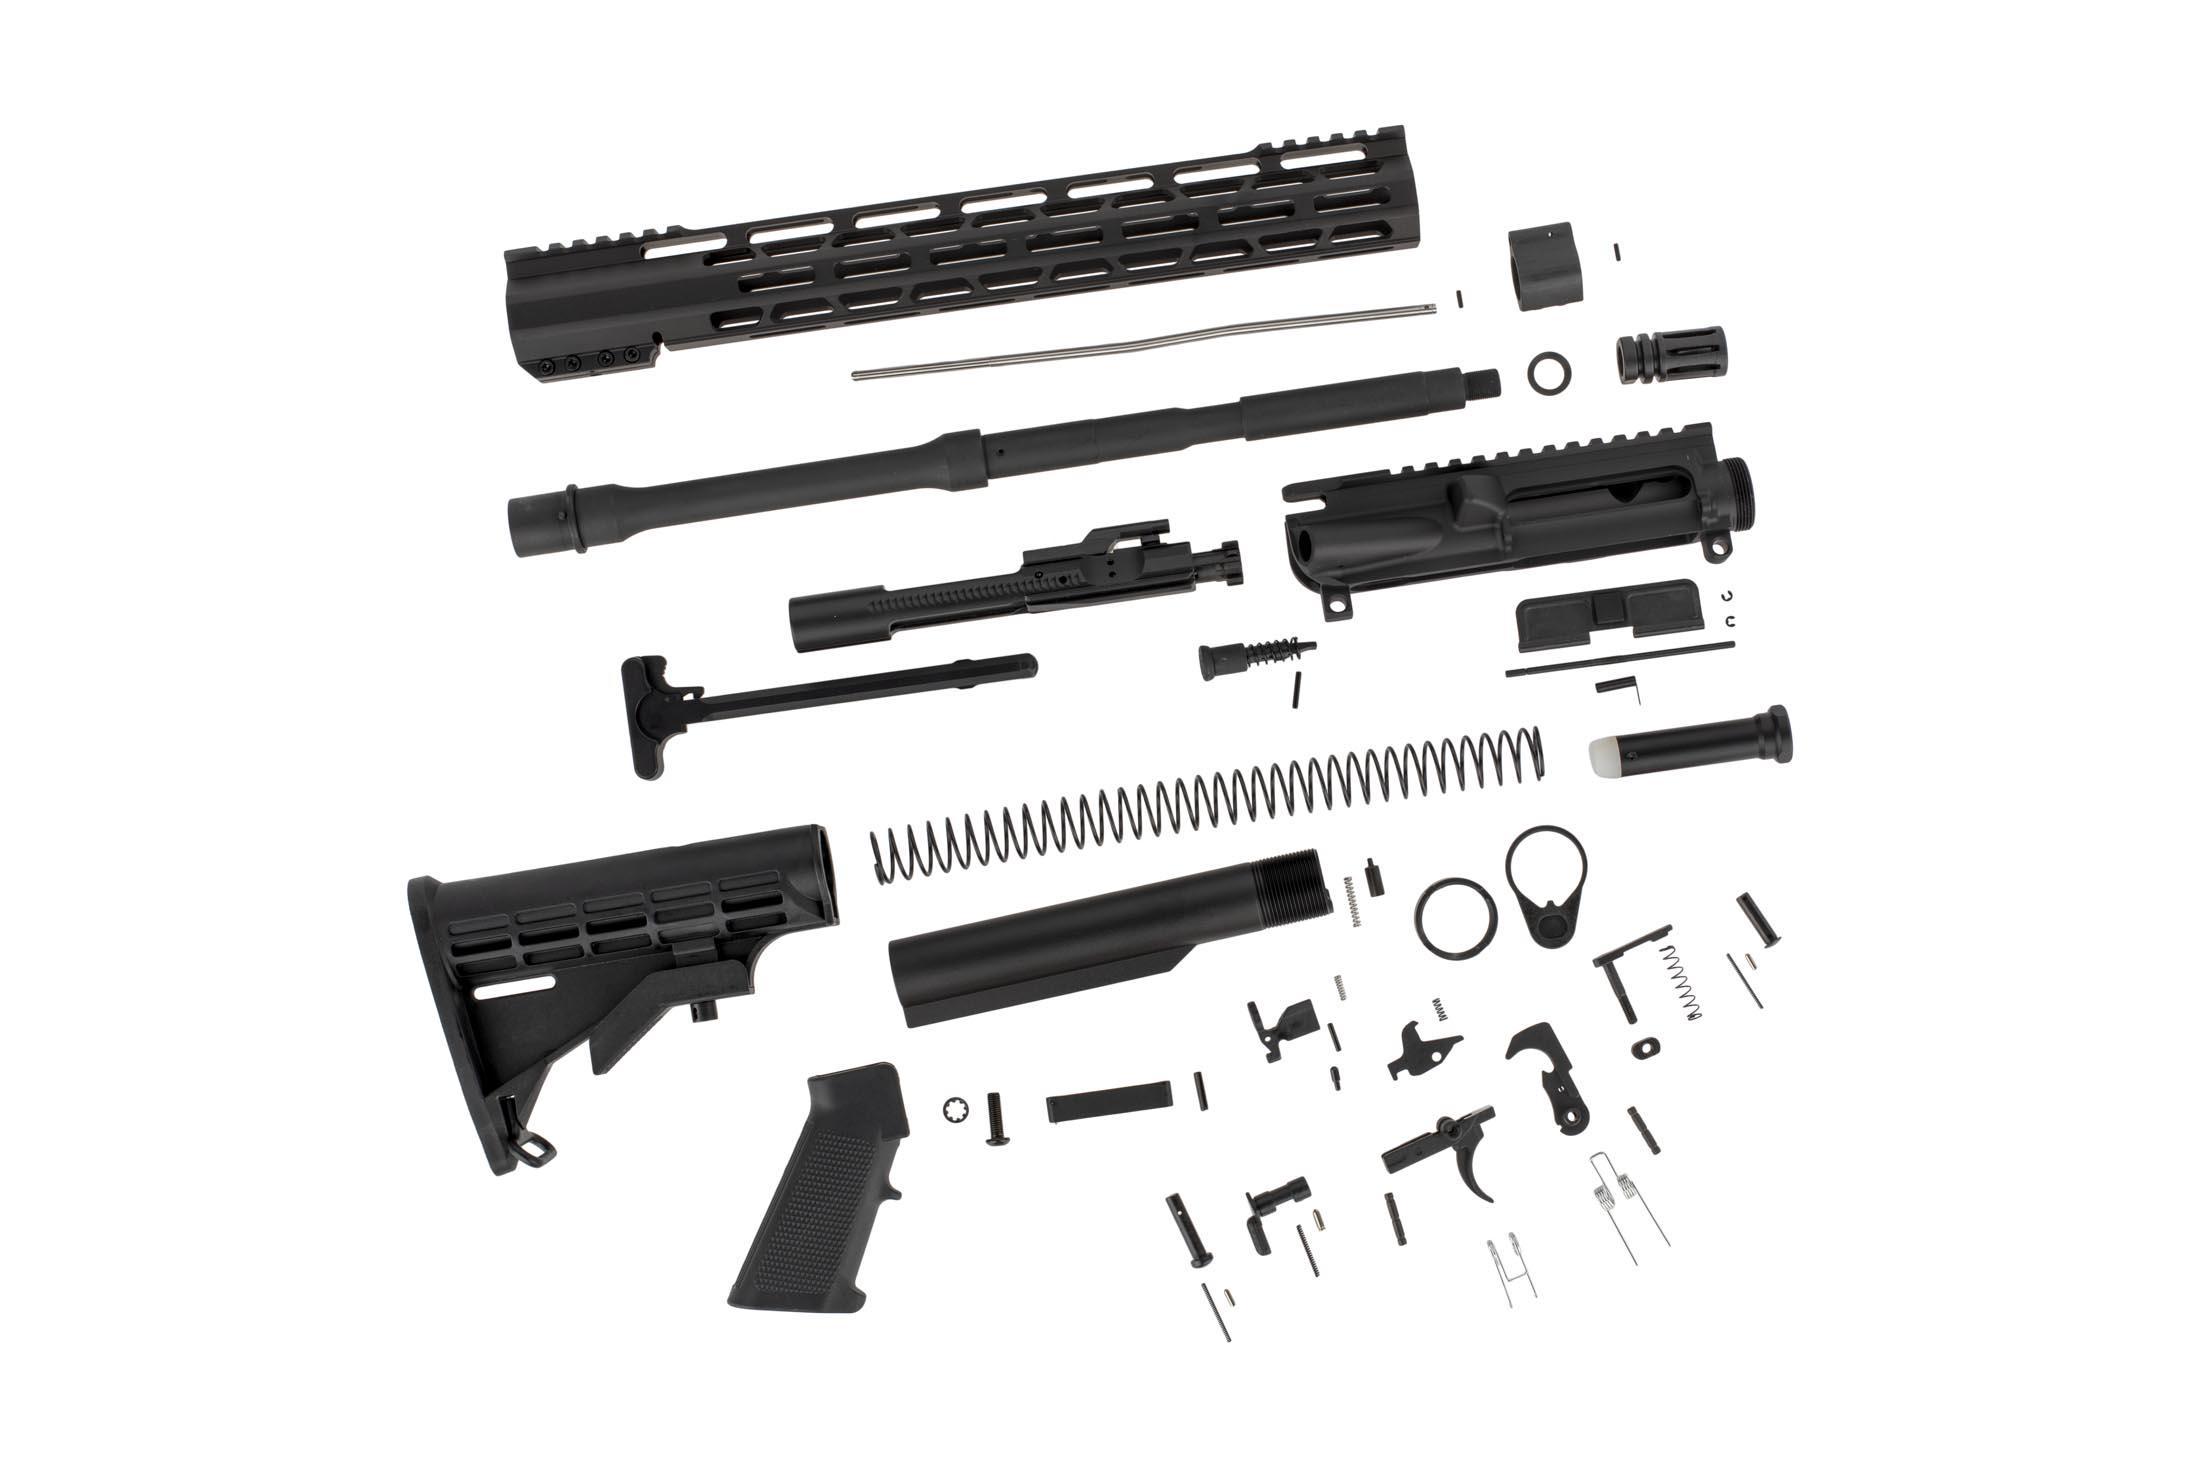 Tacfire Ar 15 Build Kit Minus Lower